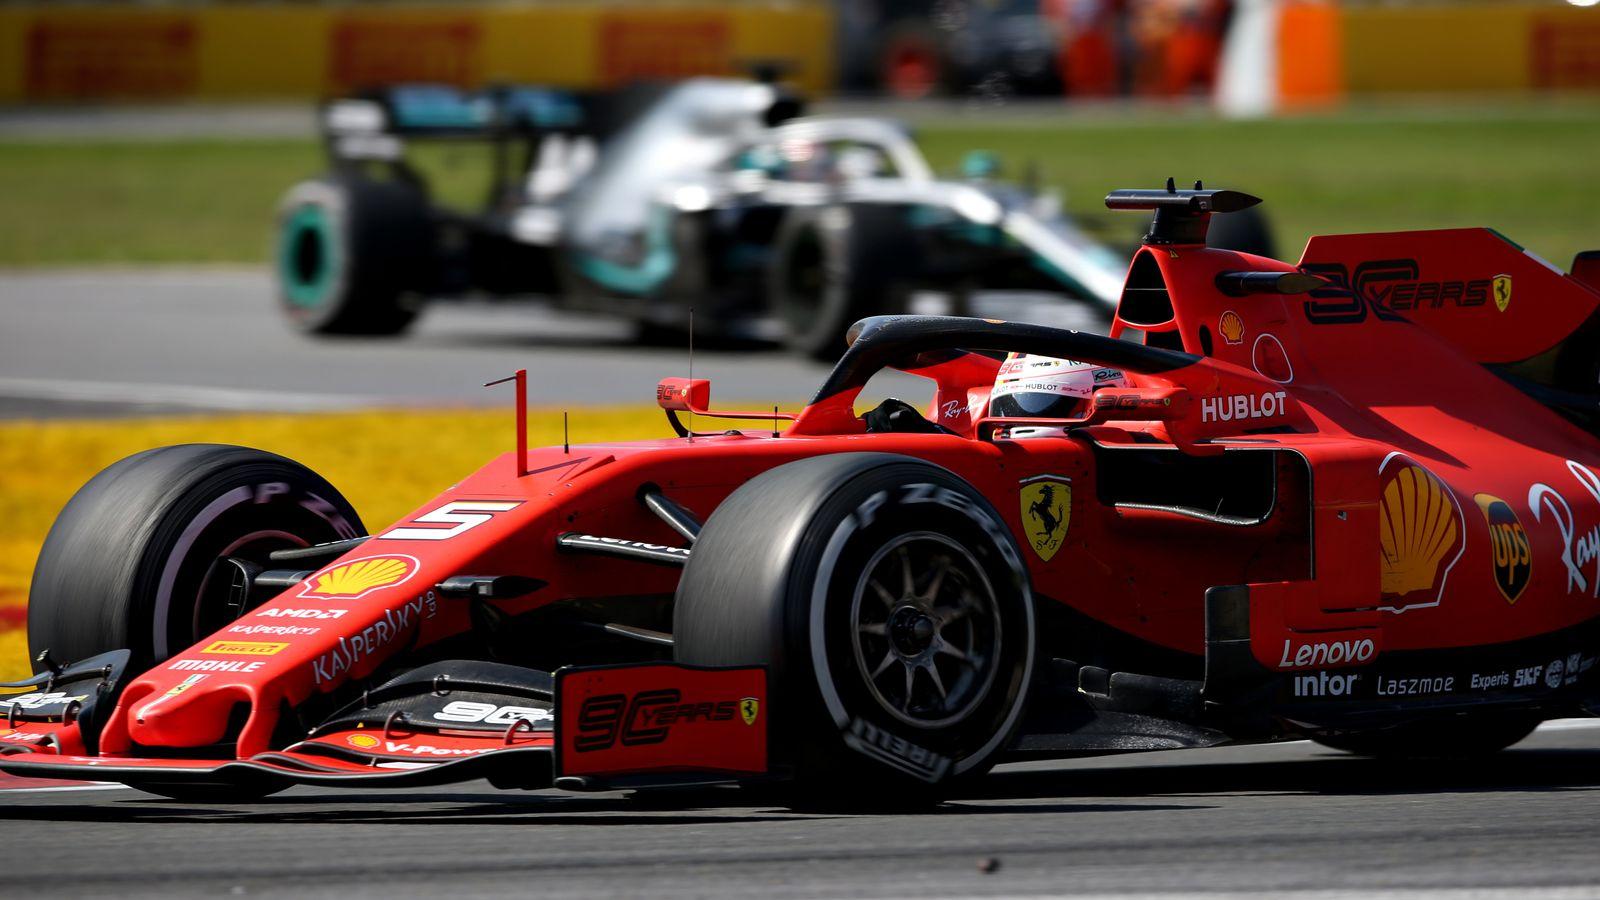 GP de Canadá novena carrera de F1 2020 se cancelará debido a coronavirus 13